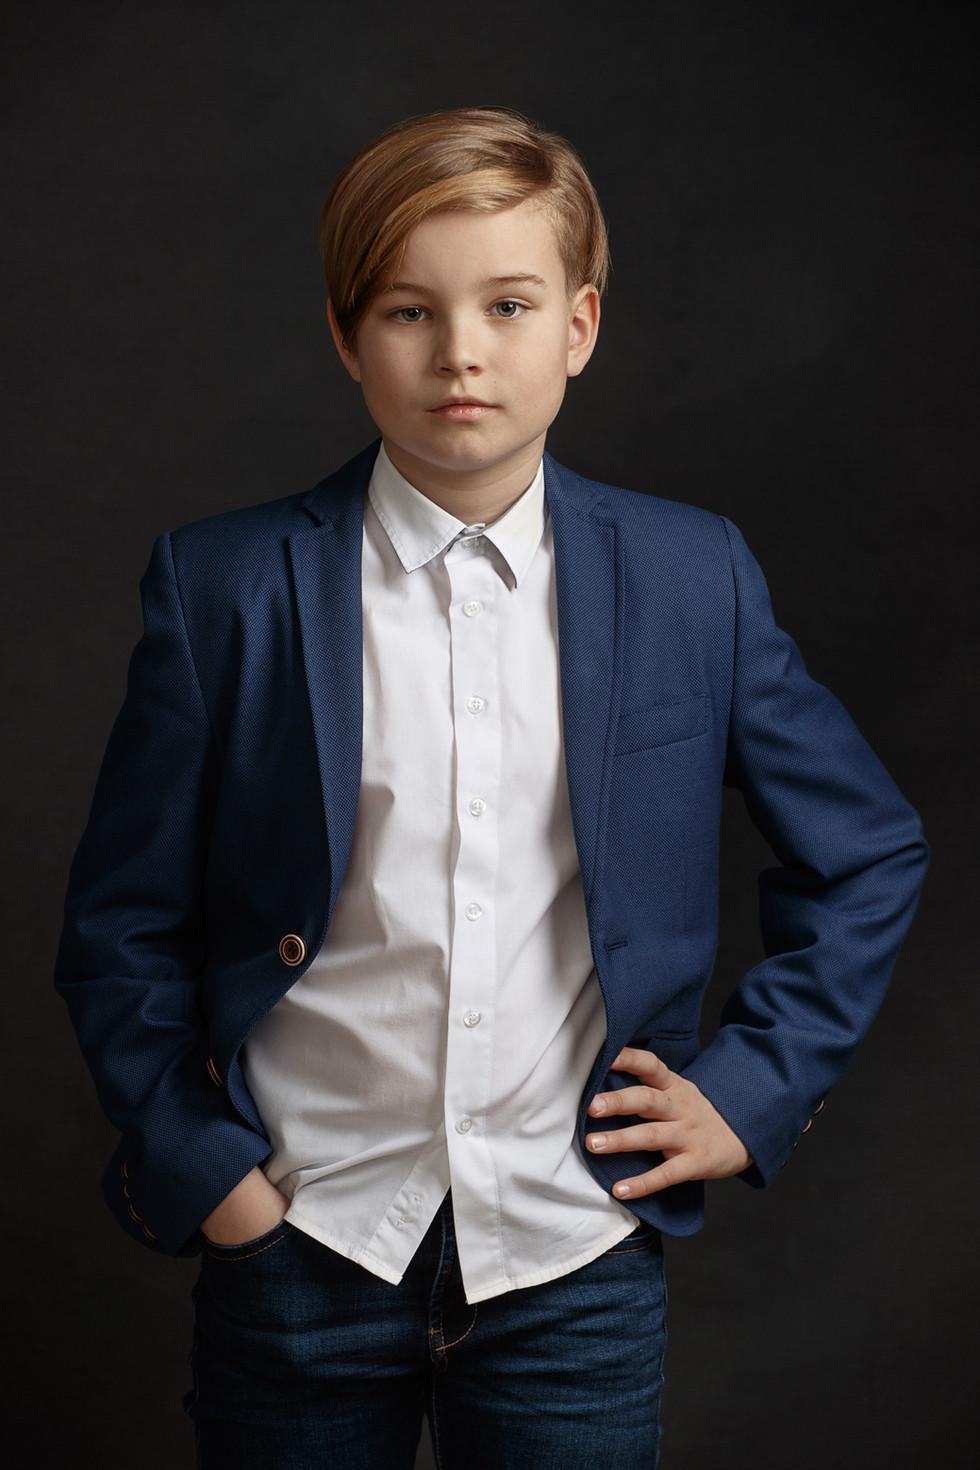 Poiss ülikonnas